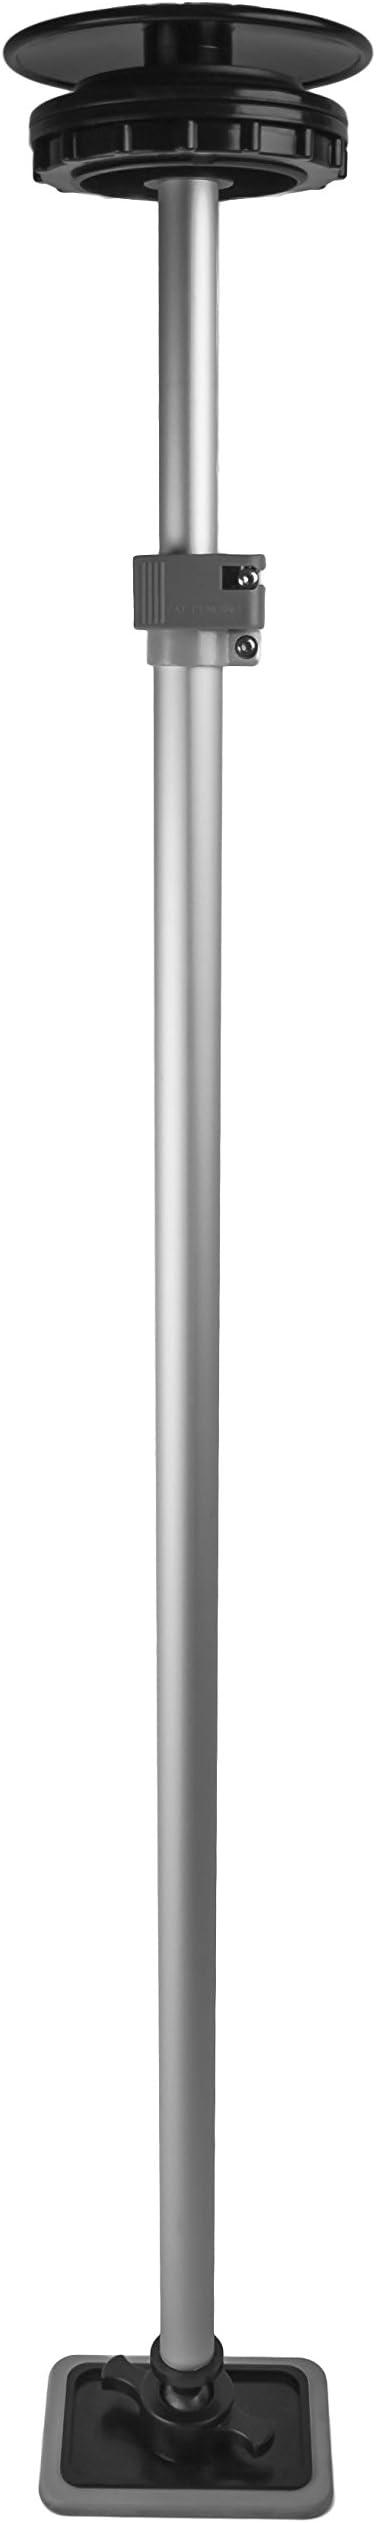 Vico Marine Support Pole + Boat Vent 3 + Pole Base